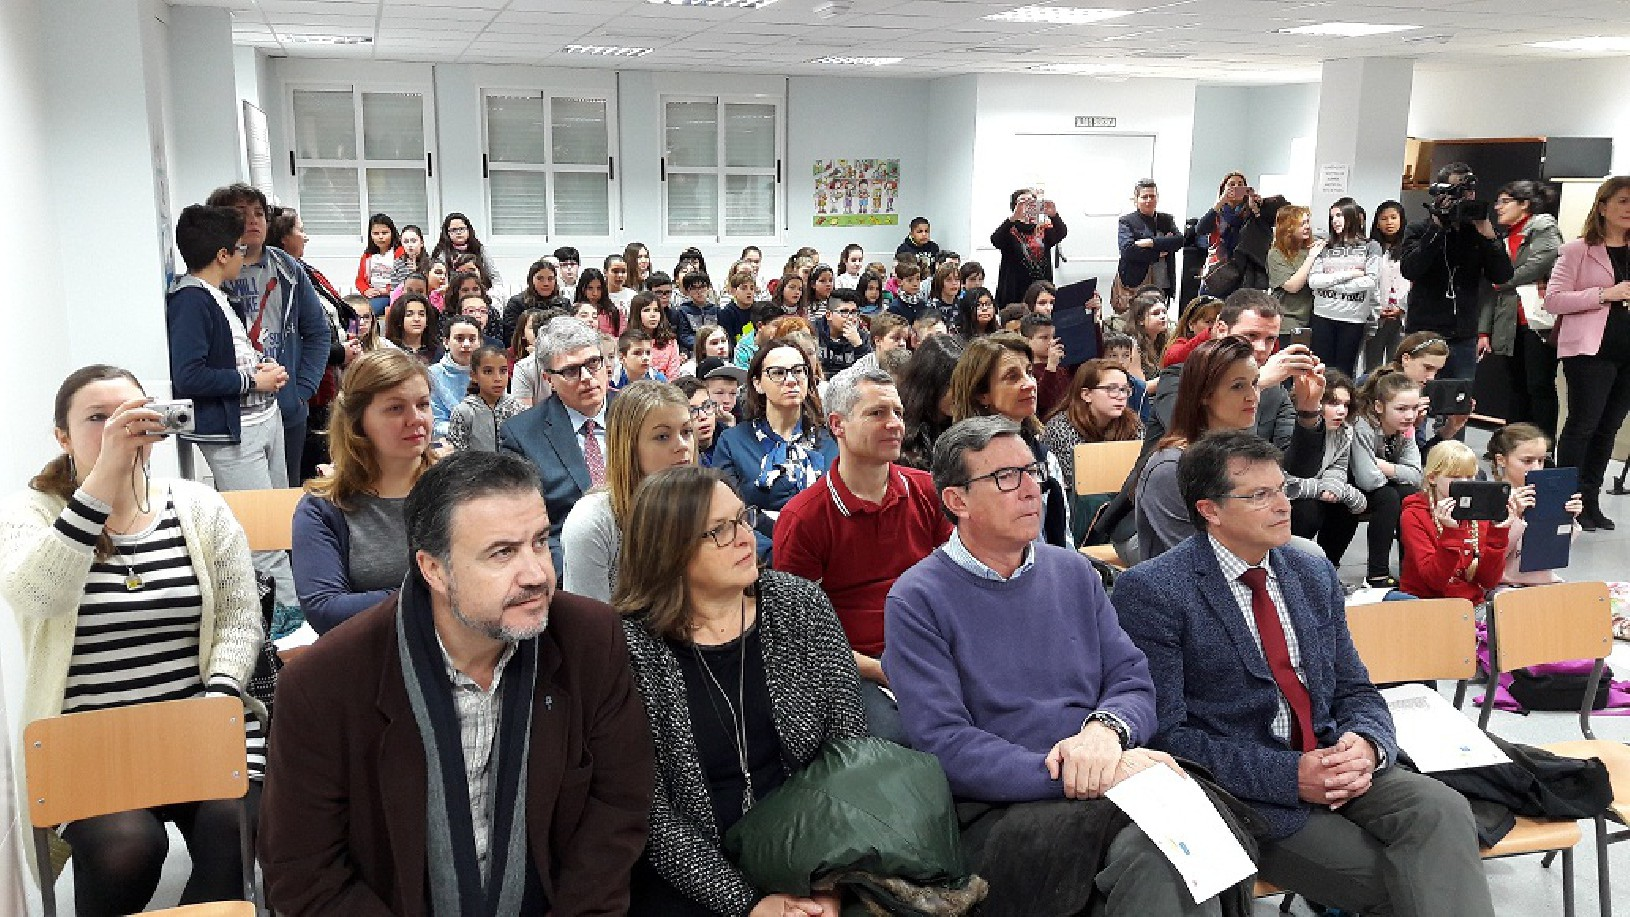 http://www.lorca.es/notasPrensaIMG/grandes/1124277022017998709.jpg